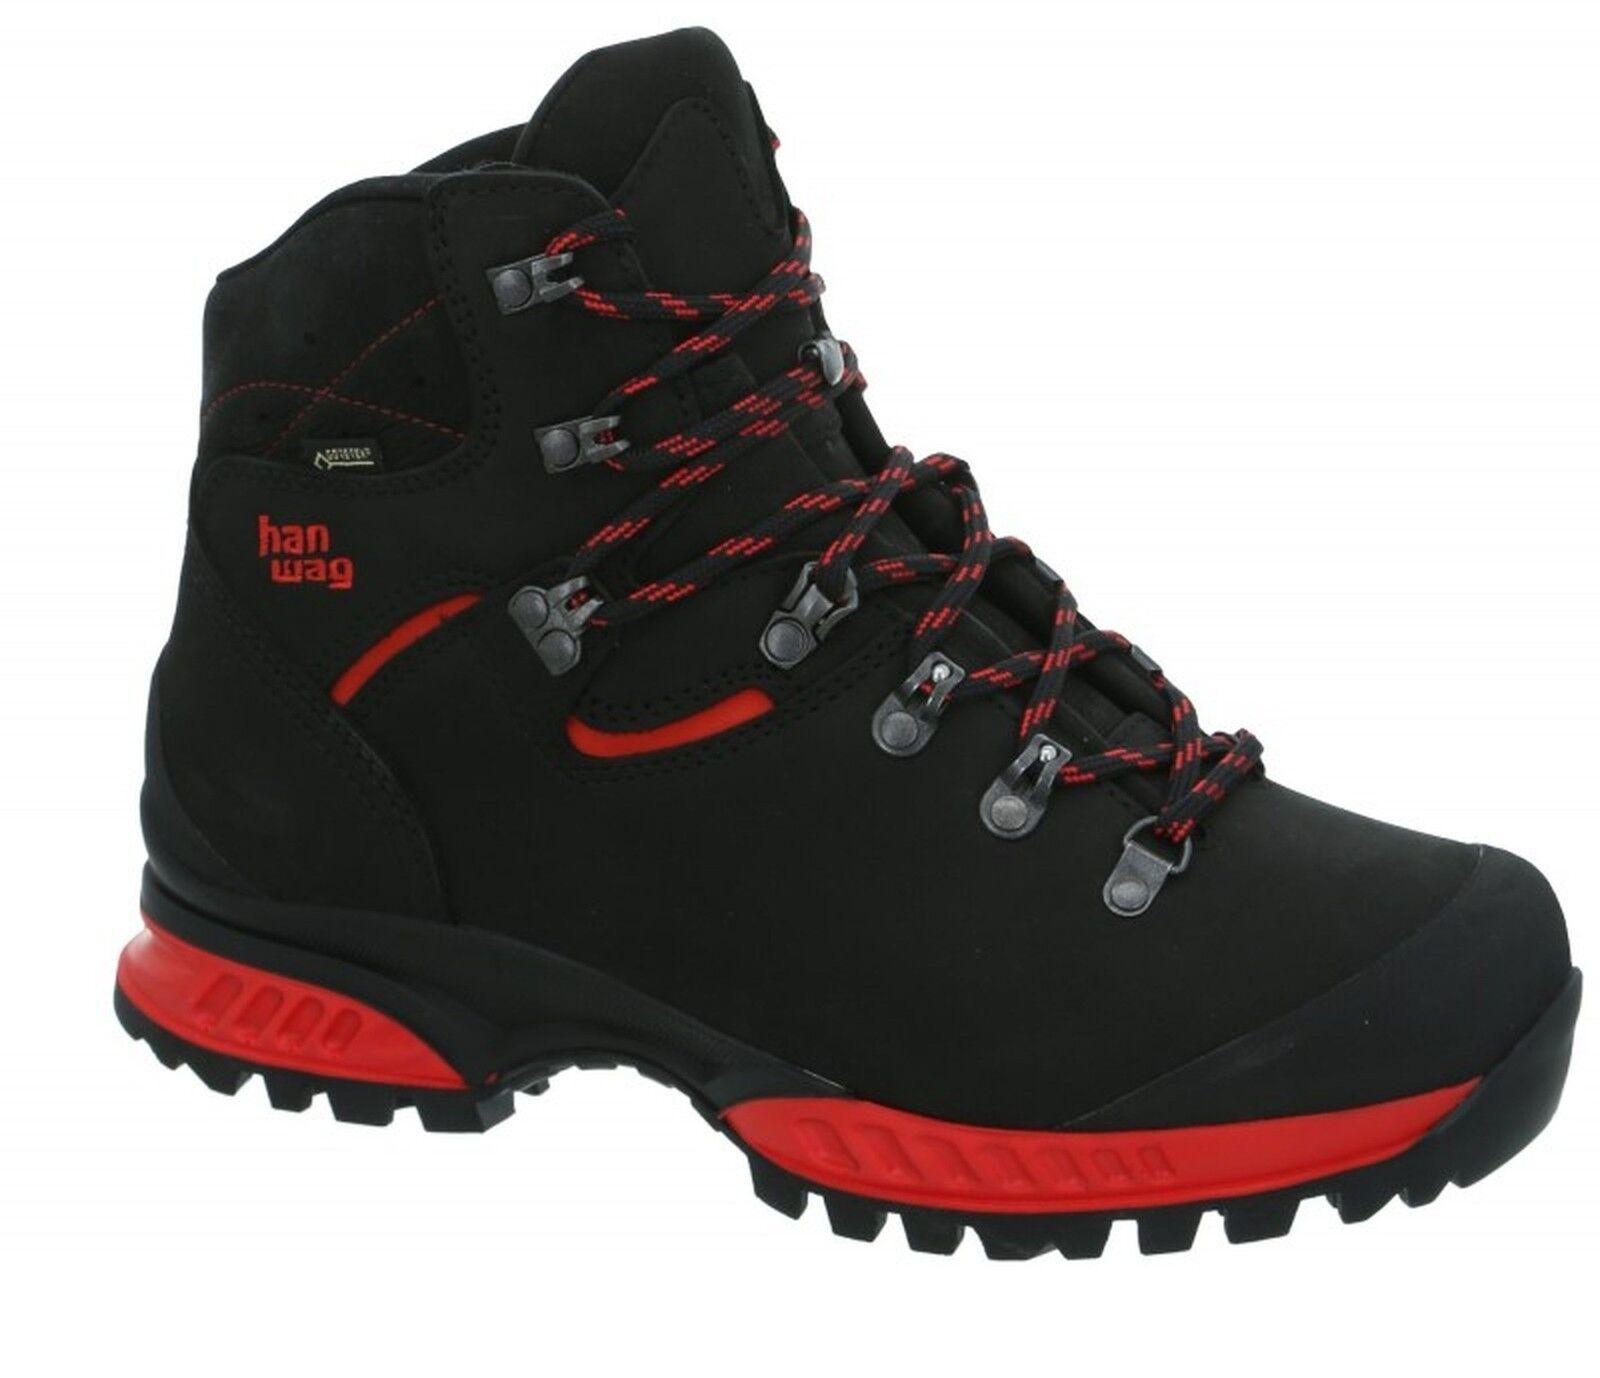 Hanwag montaña zapatos Tatra II GTX tamaño 7,5 - 41,5 negro-rojo